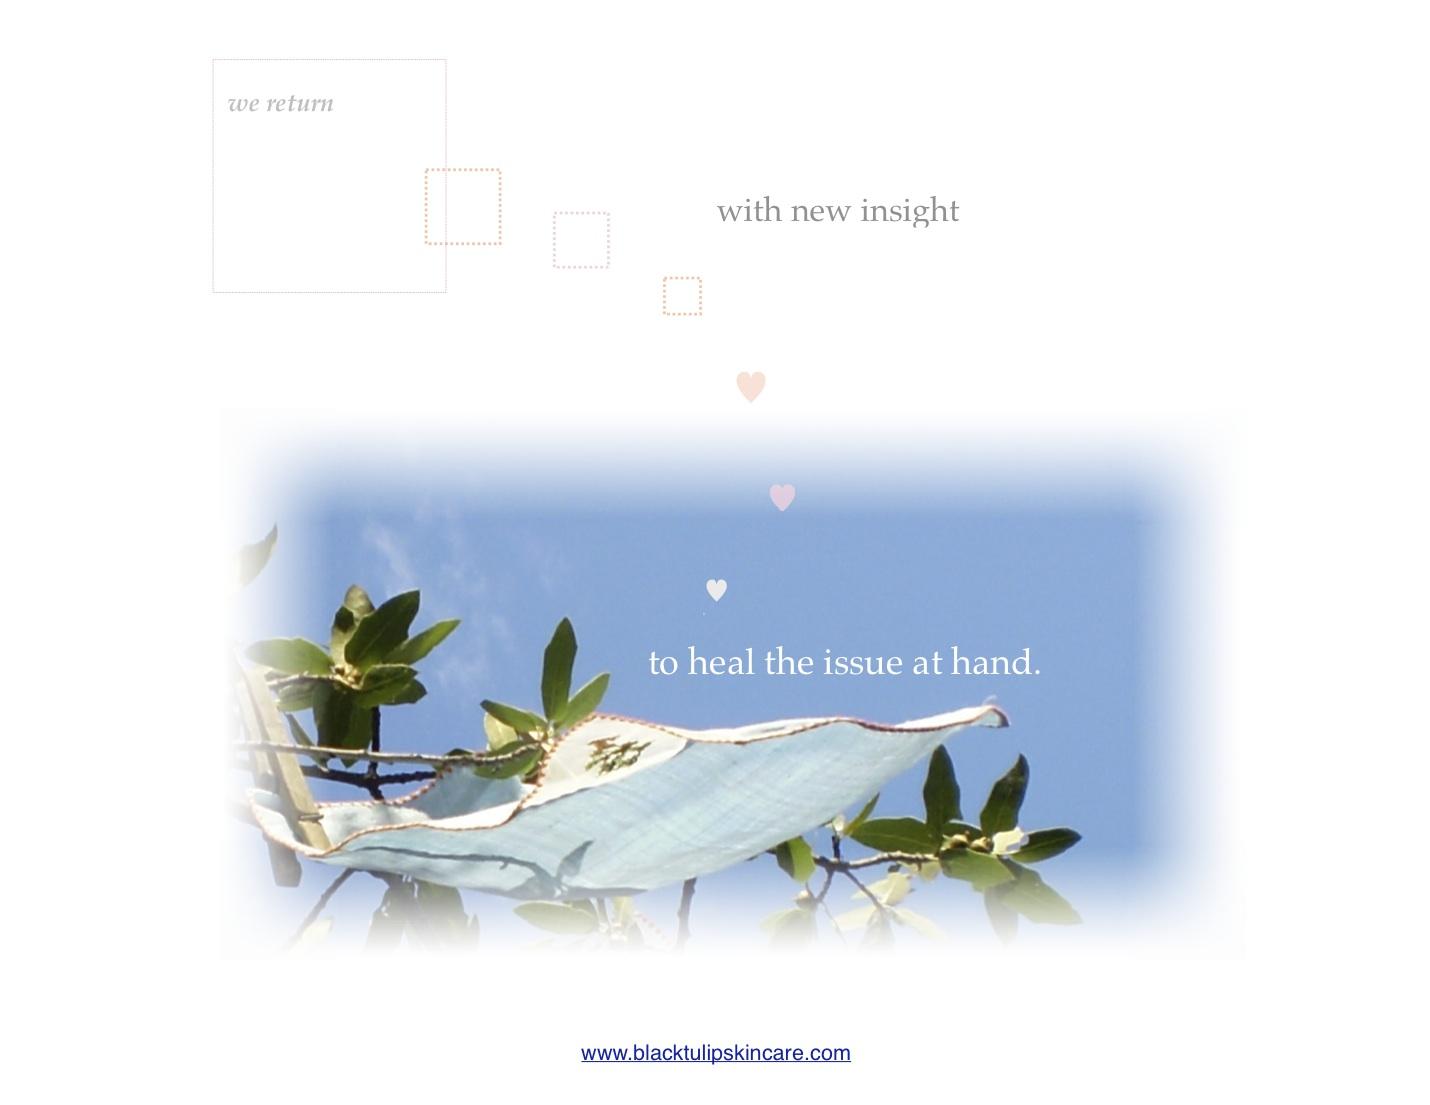 imagine-insight.jpg